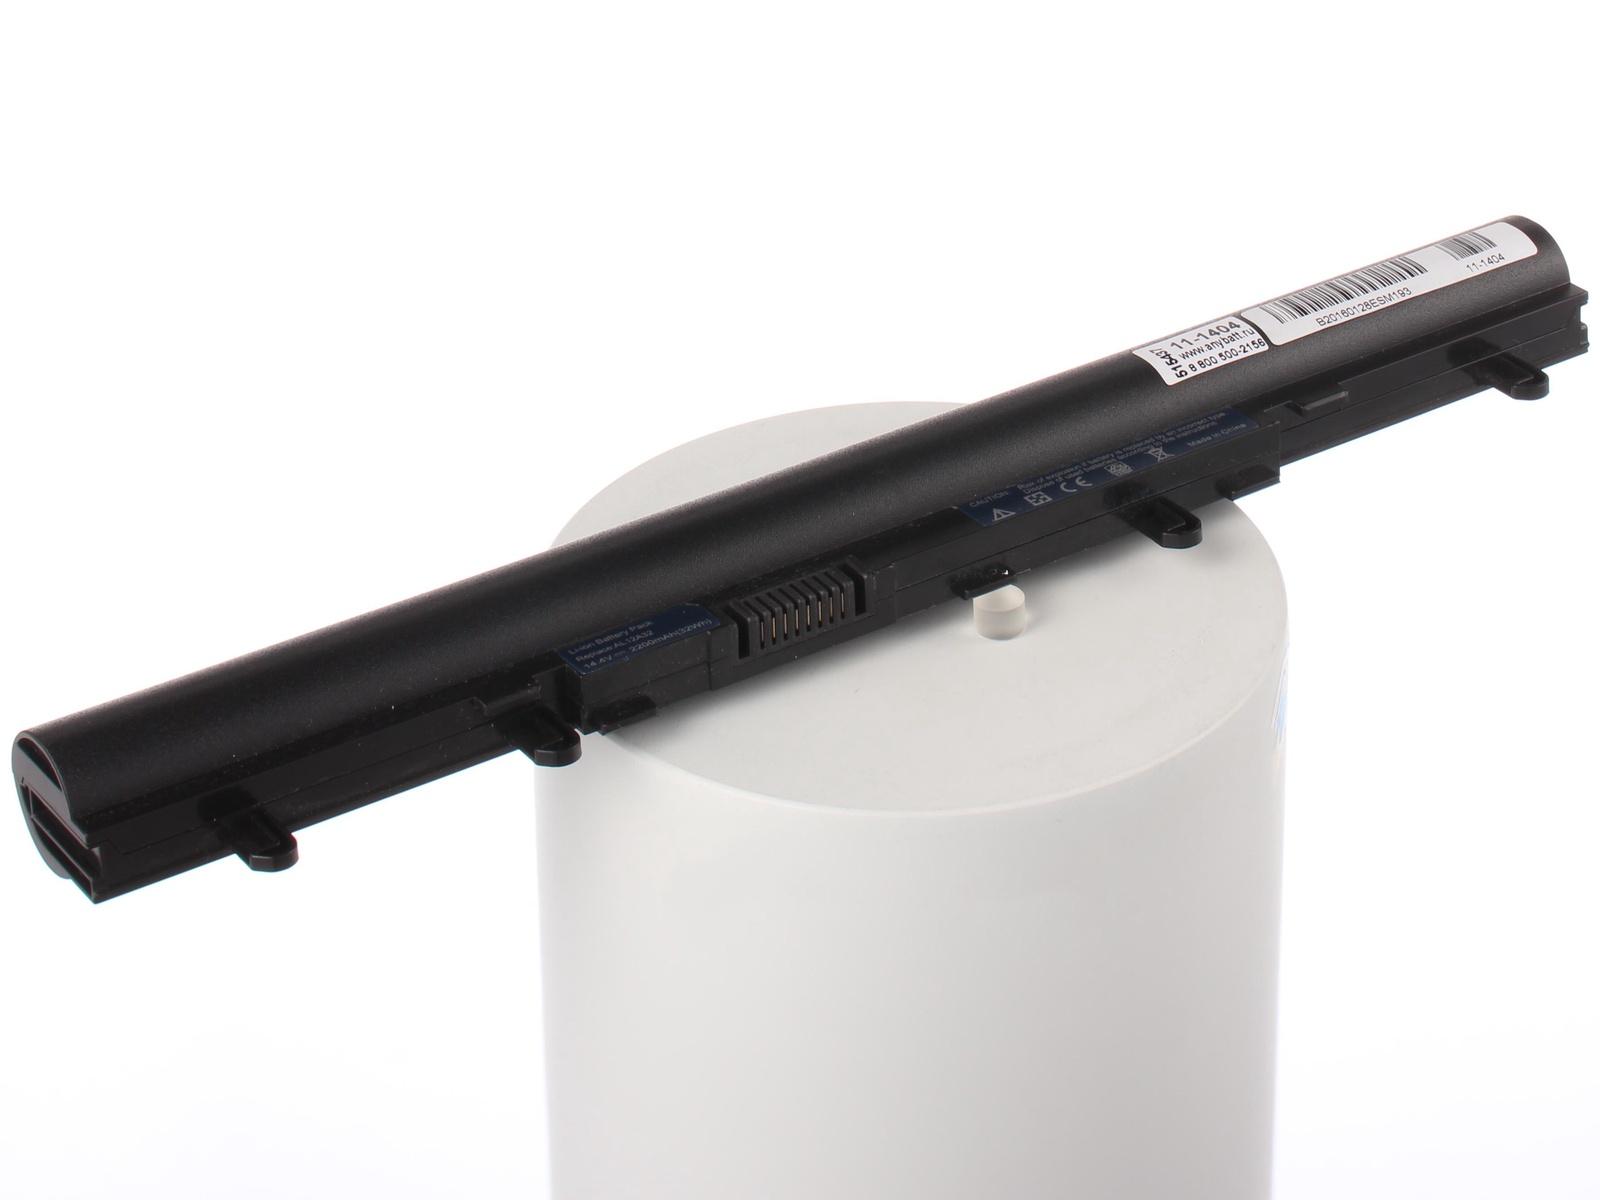 Аккумулятор для ноутбука AnyBatt для Acer Aspire E1-572G-54204G50Mnii, Aspire E1-572G-74504G1TDn, ASPIRE F5-571G-34MK, Aspire V5-571G-53336G50Mass, Aspire F5-571G-P98G, Aspire V5-551G-84556G75Ma, Aspire V5-571G-32364G50Makk 15 6 laptop lcd matrix screen for acer aspire v5 551g v5 551 v5 531g v5 531 v5 571 v5 571g zr7 pew71 1366x768 40pin